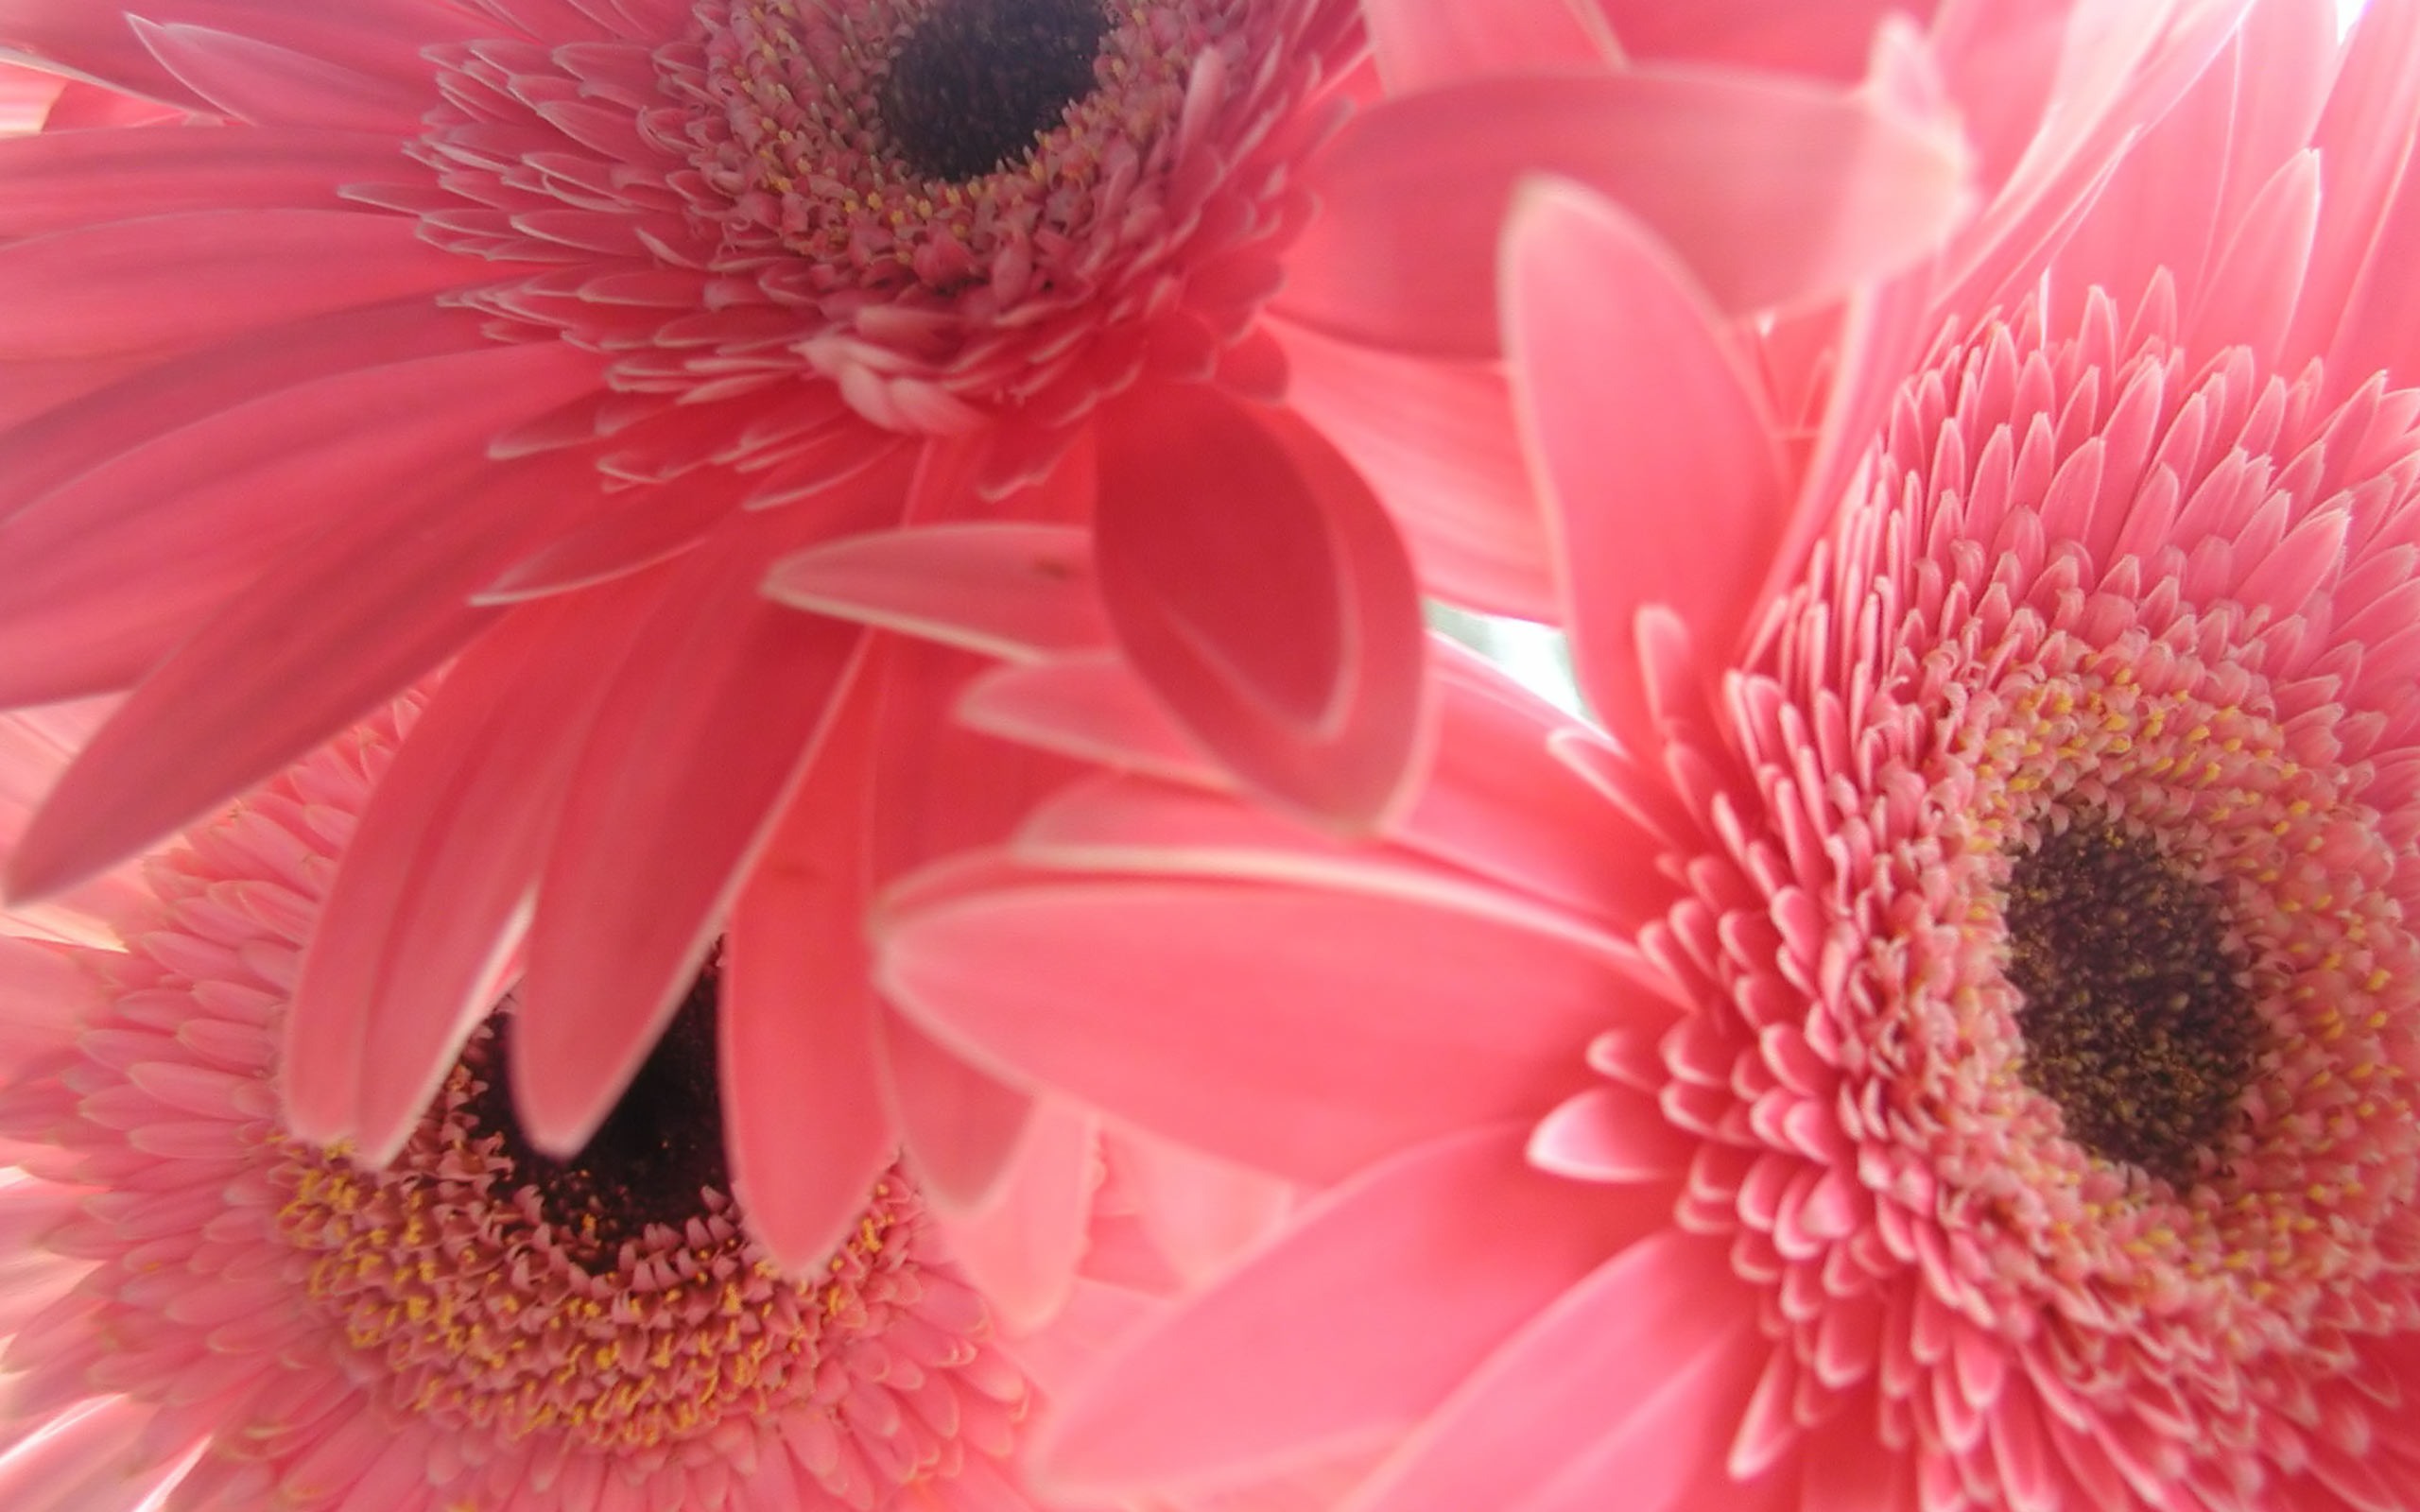 Pink Flower Backgrounds   wallpaper, wallpaper hd, background desktop